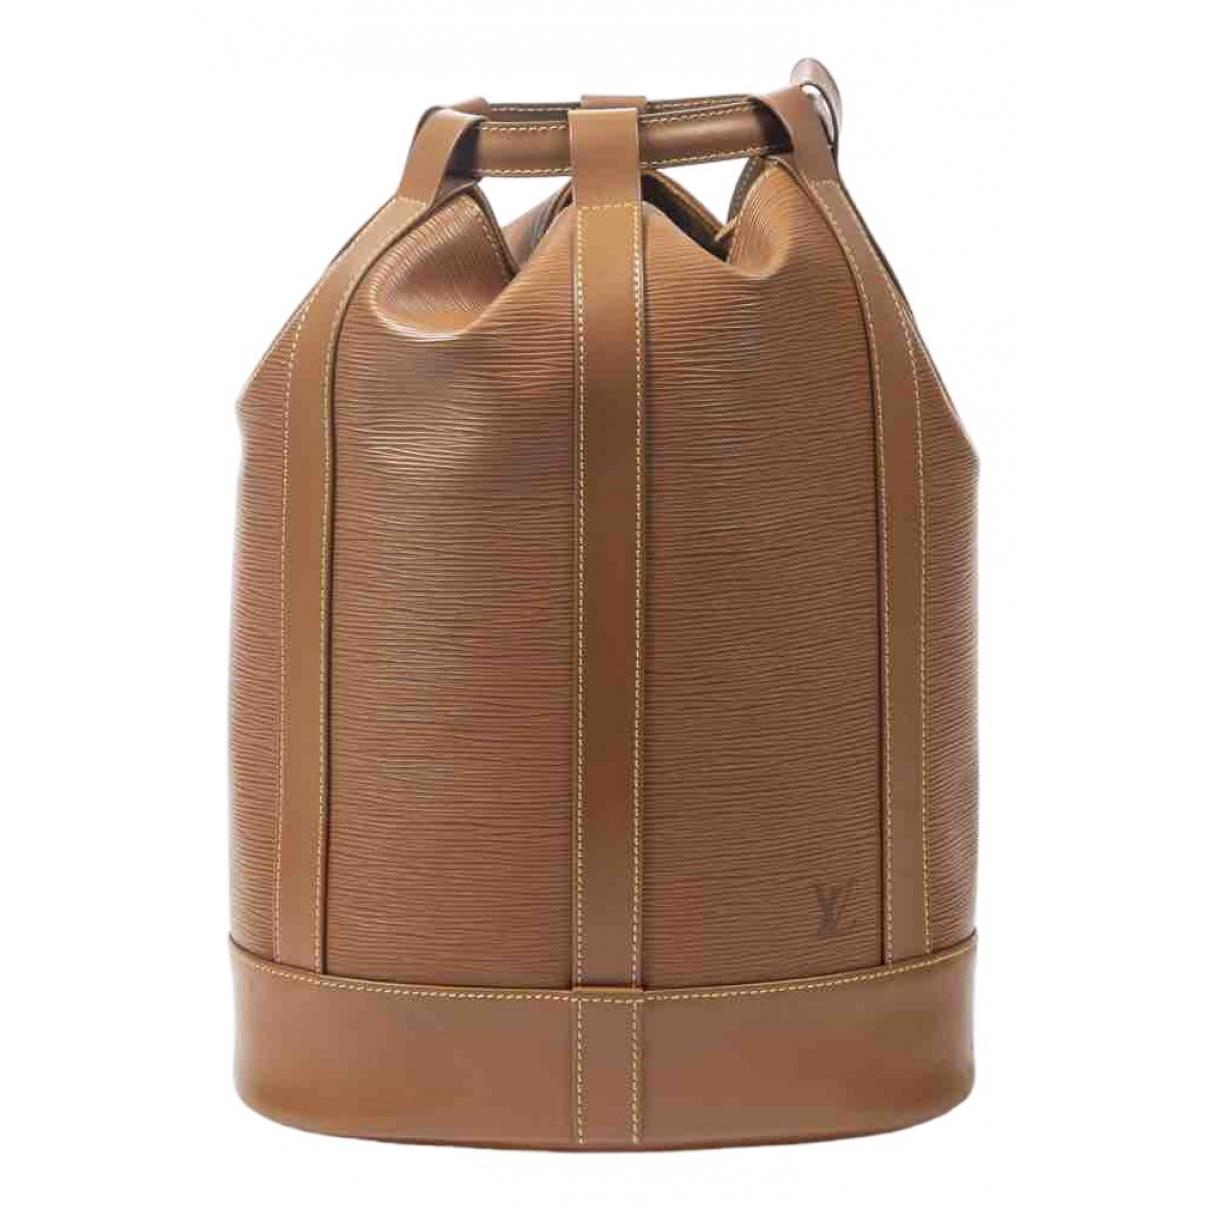 Louis Vuitton - Sac a dos Randonnee pour femme en cuir - marron